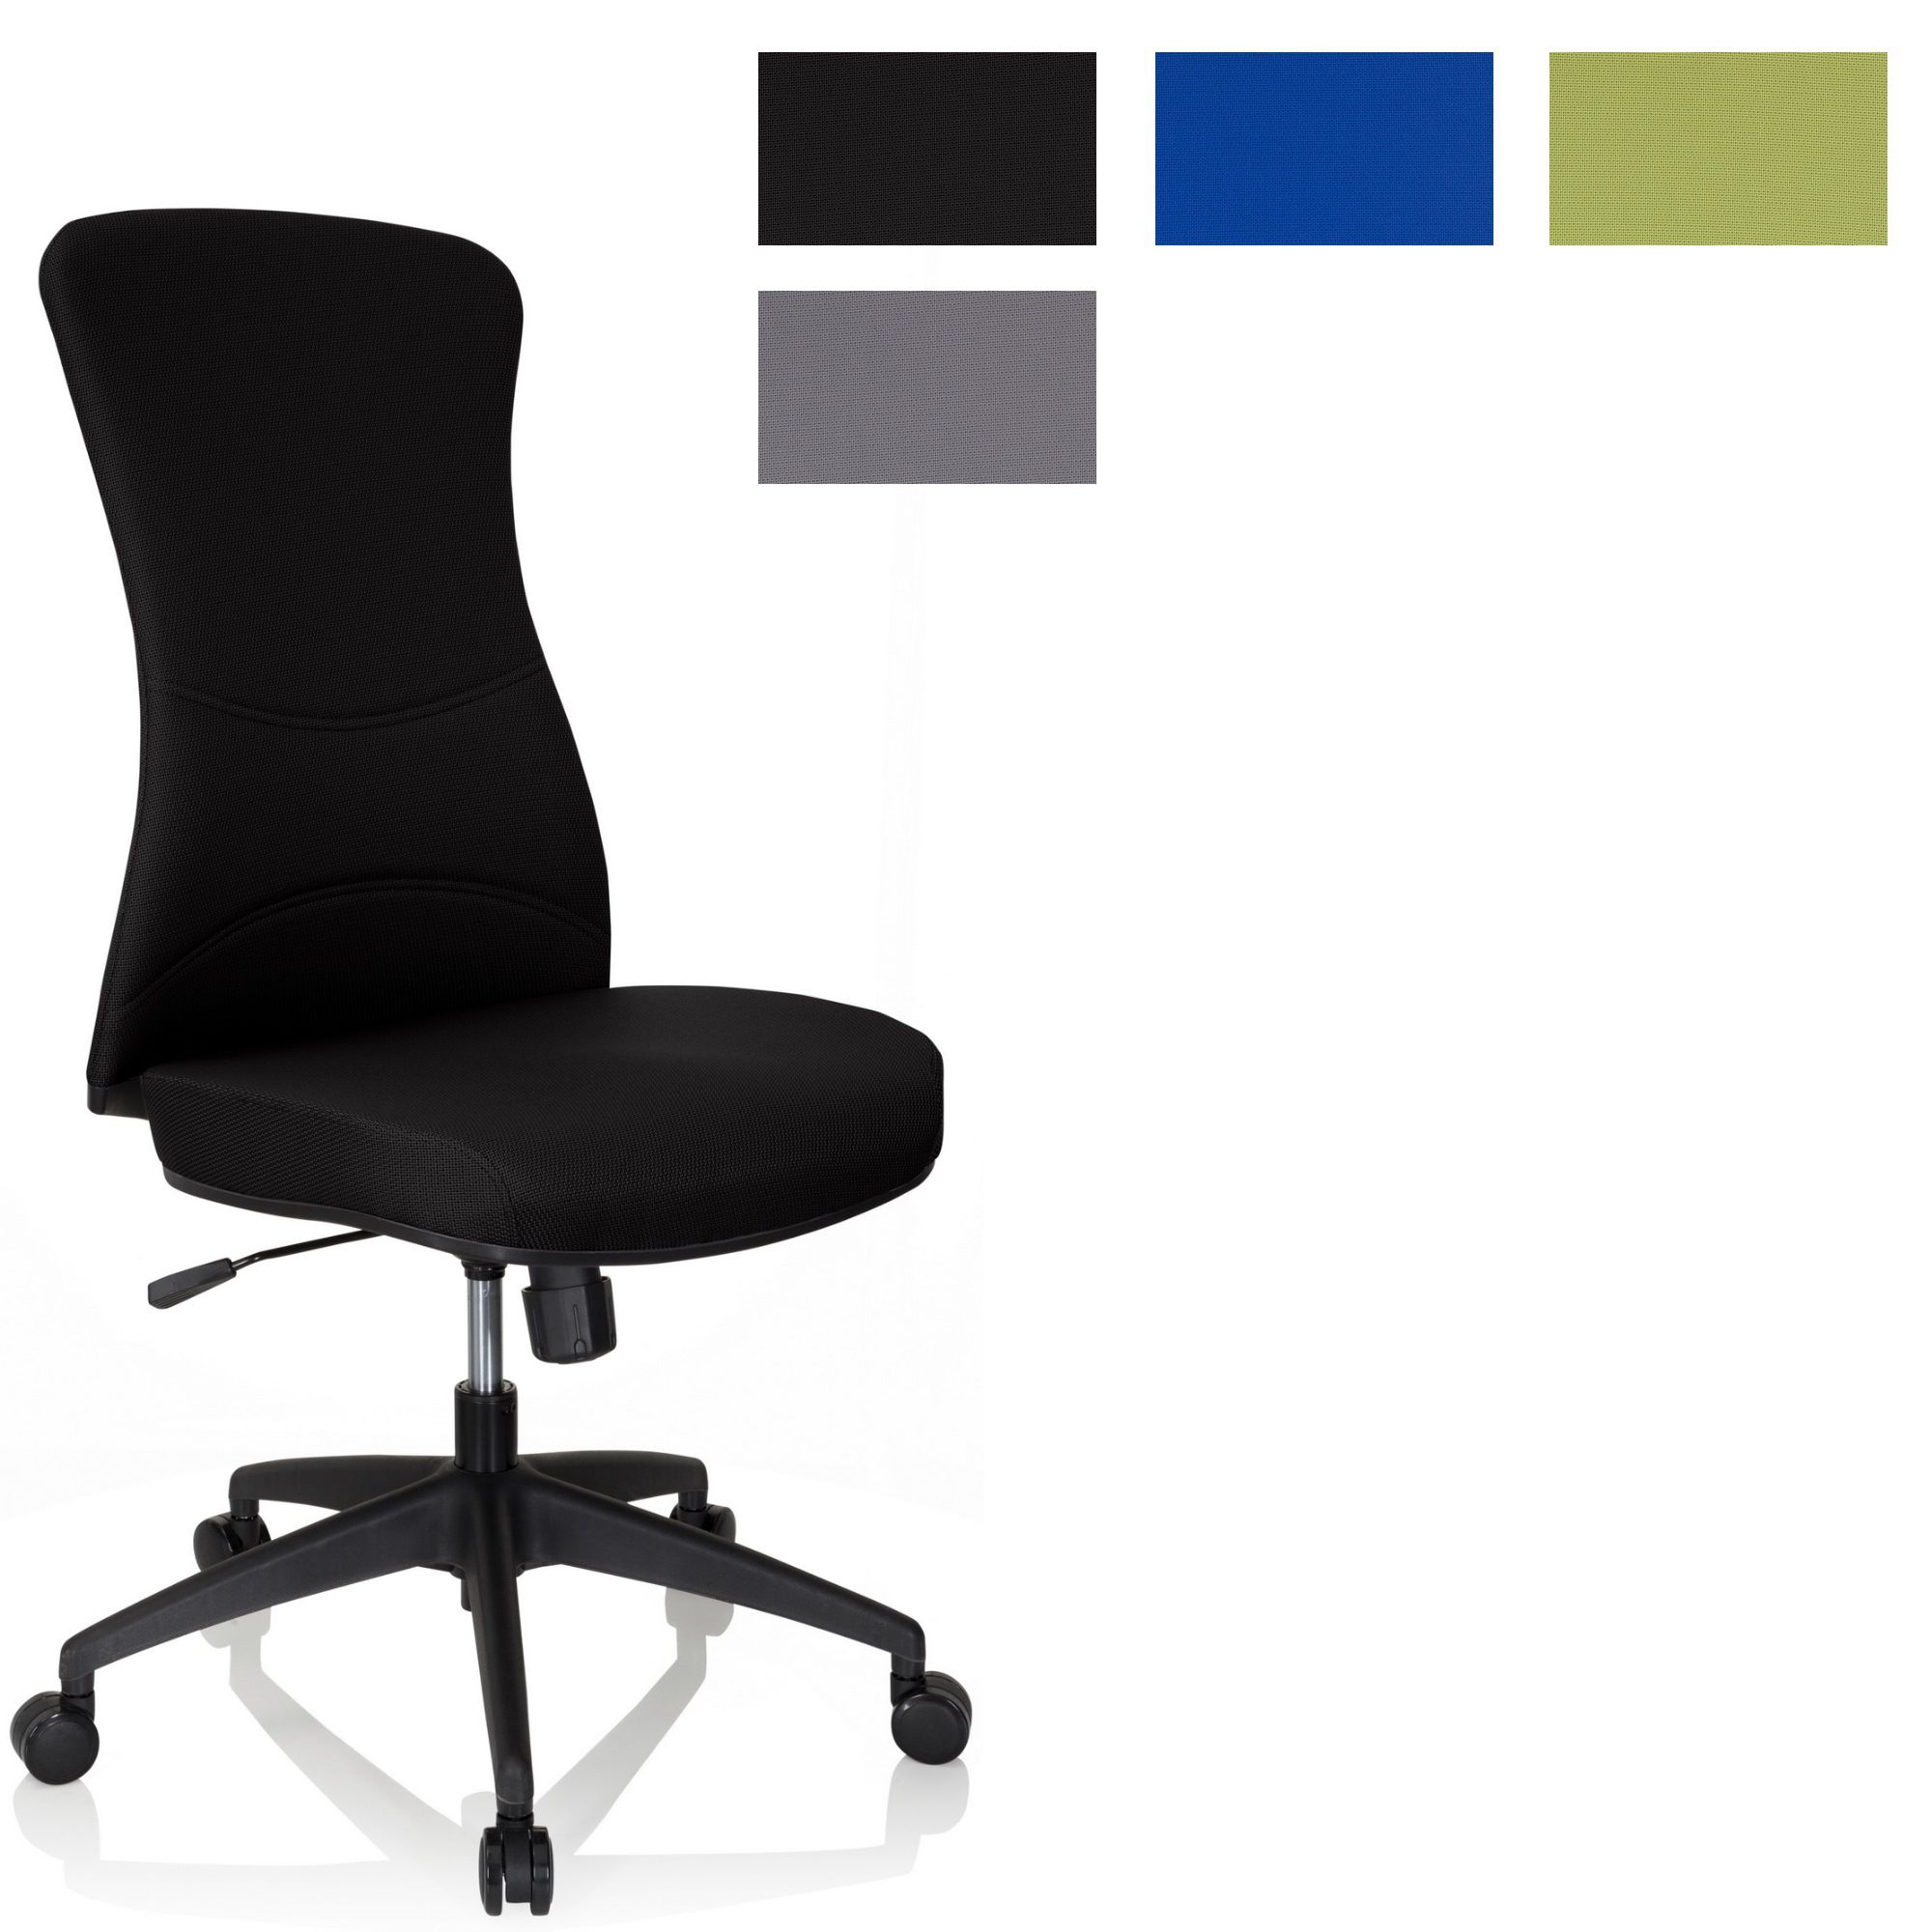 Bürostuhl Drehstuhl Schreibtischstuhl höhenverstellbar Stoff hjh OFFICE XT